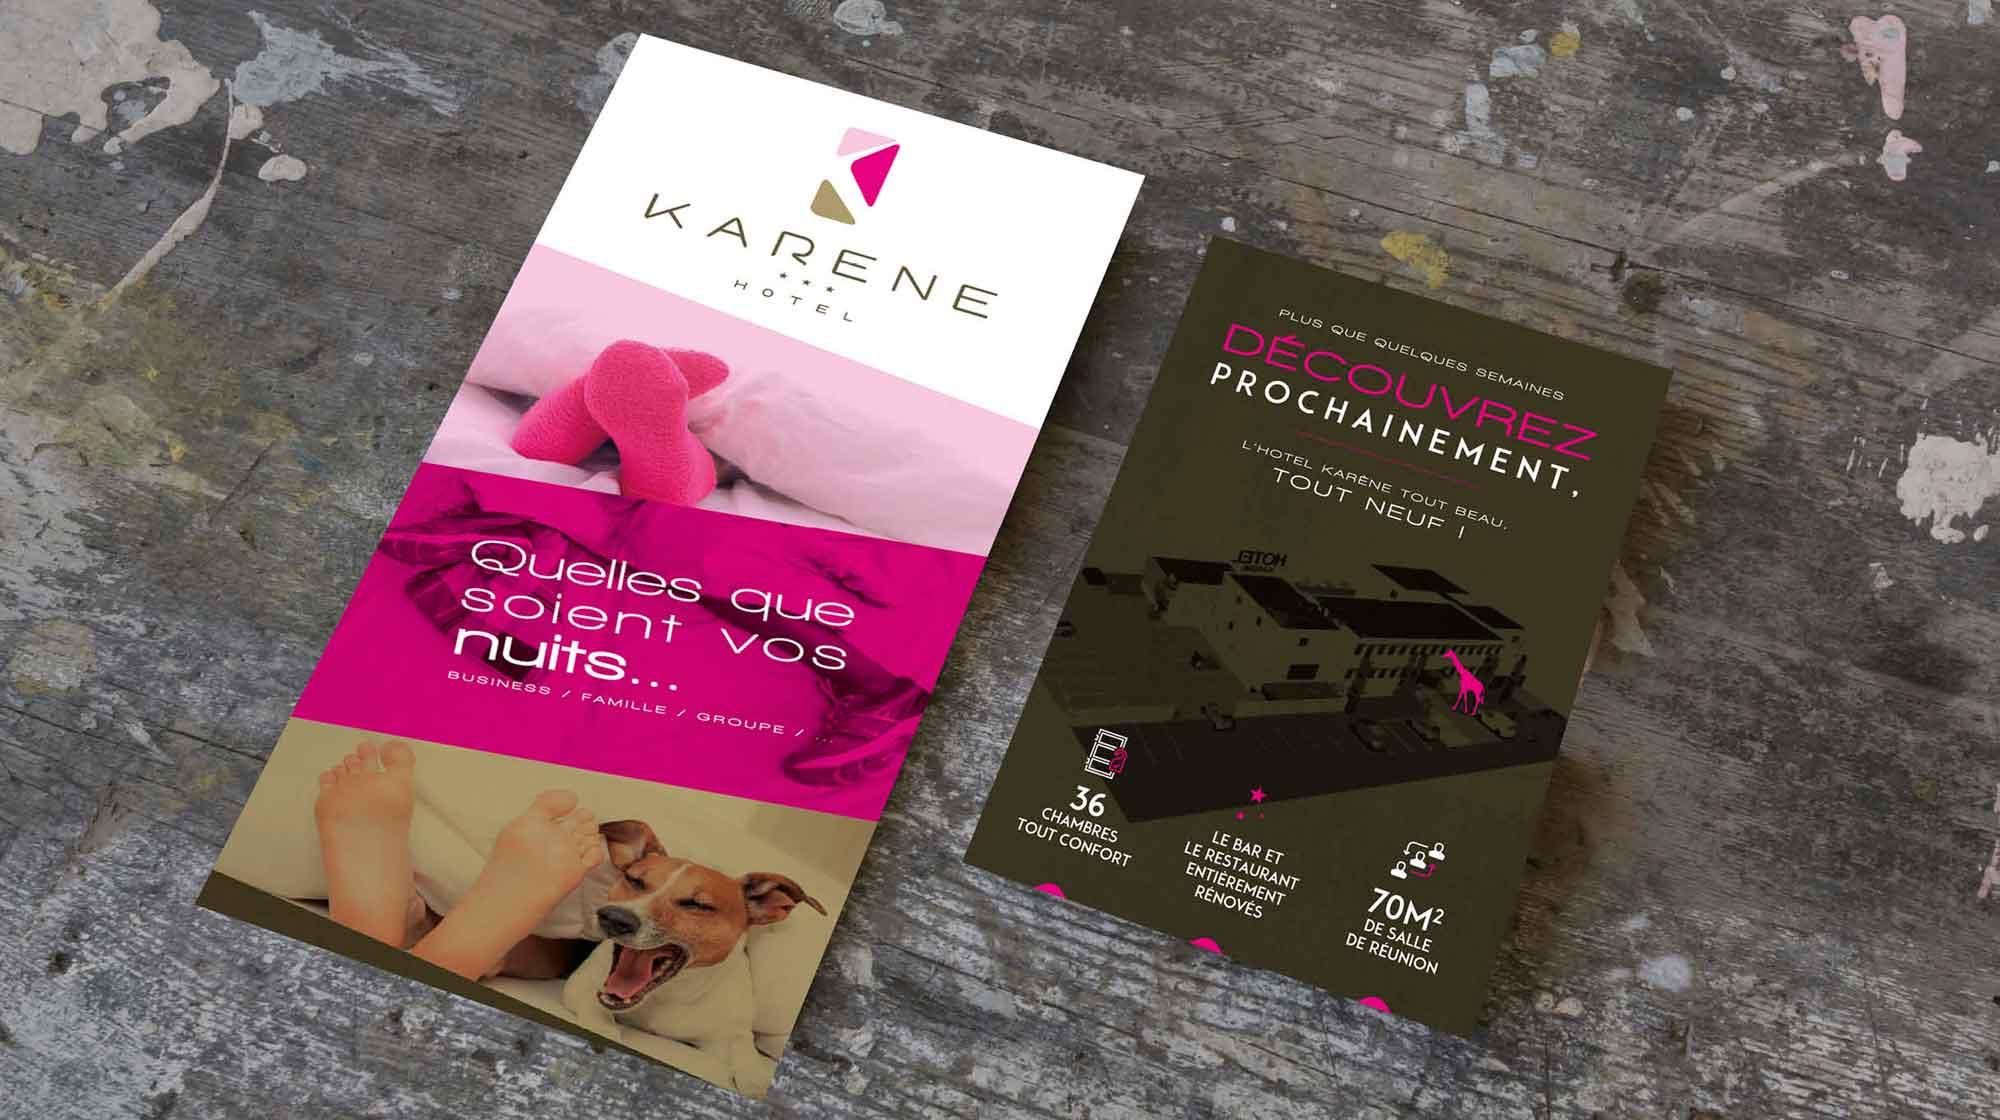 reference-hotel-karene-7